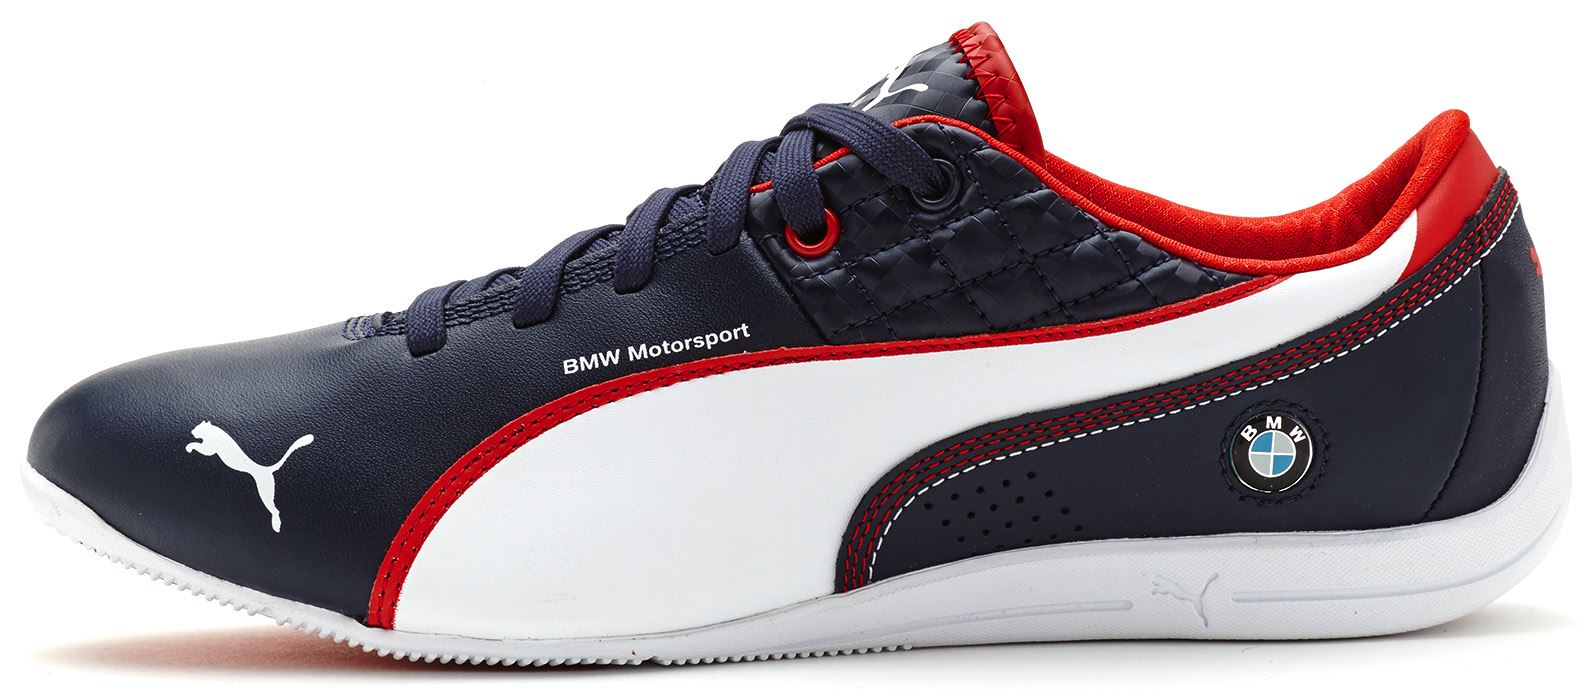 Puma Bmw MS 30548301 bianco scarpe basse